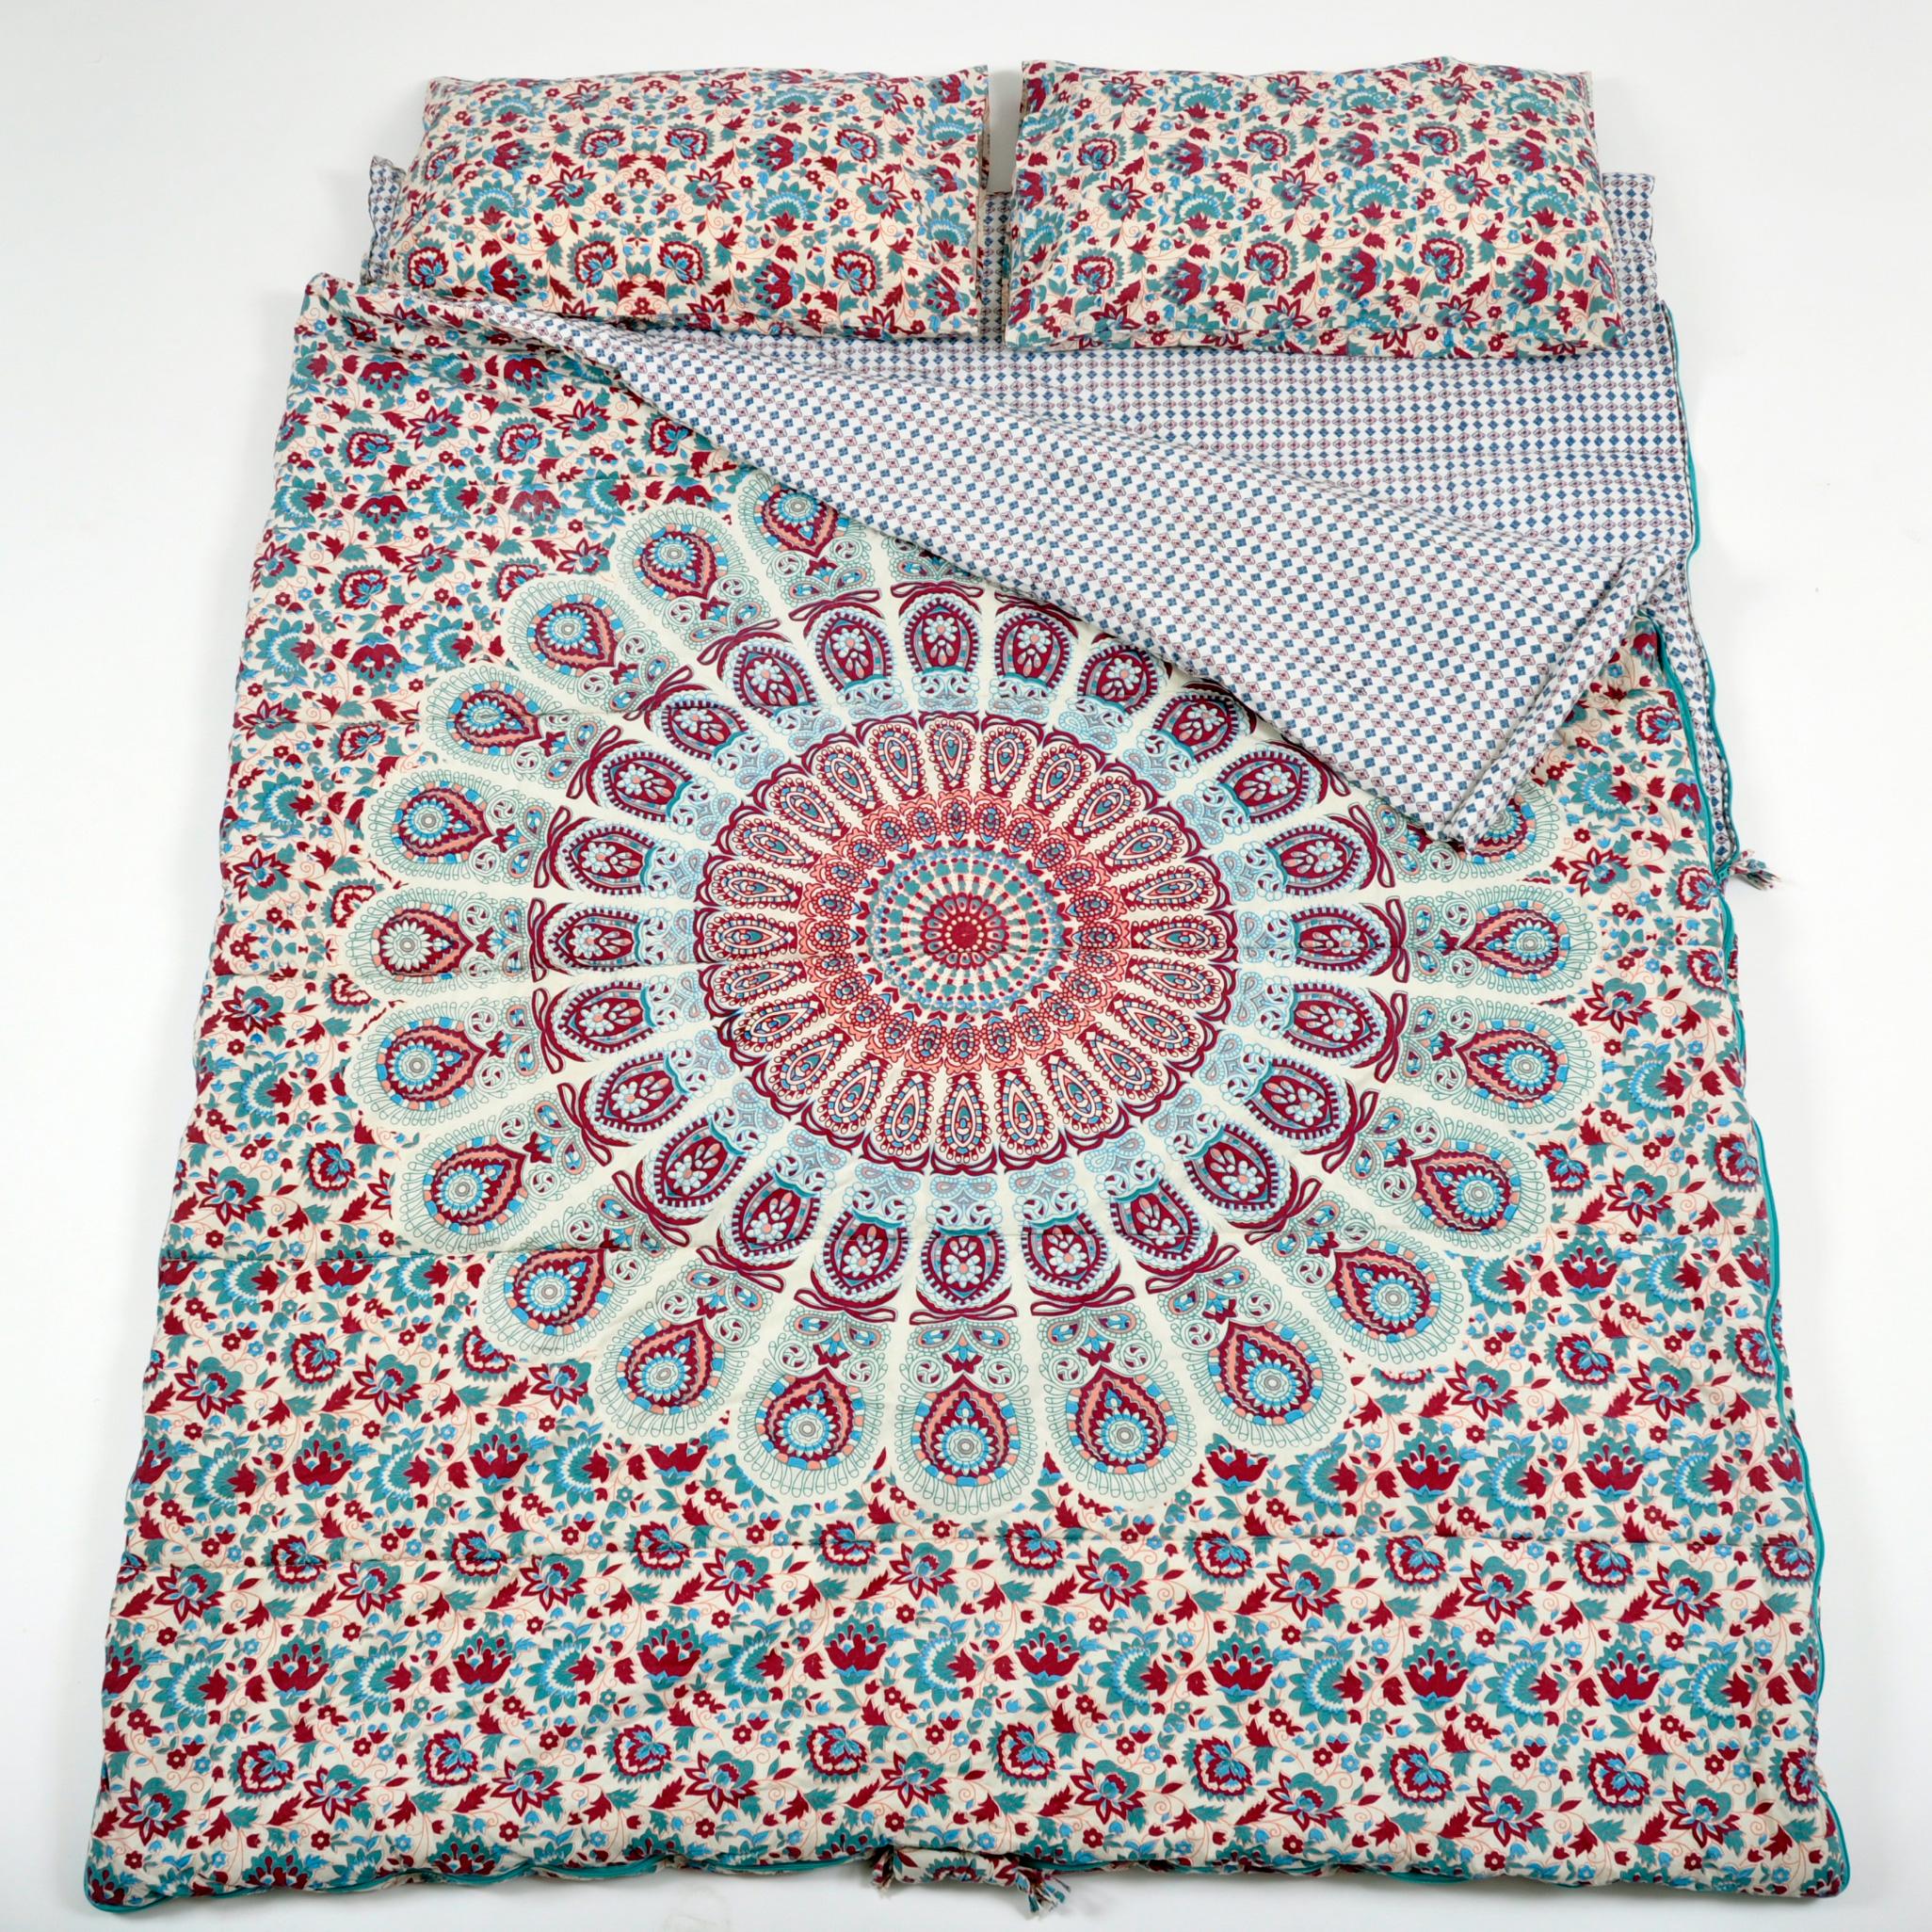 Double sleeping bag in Peacock